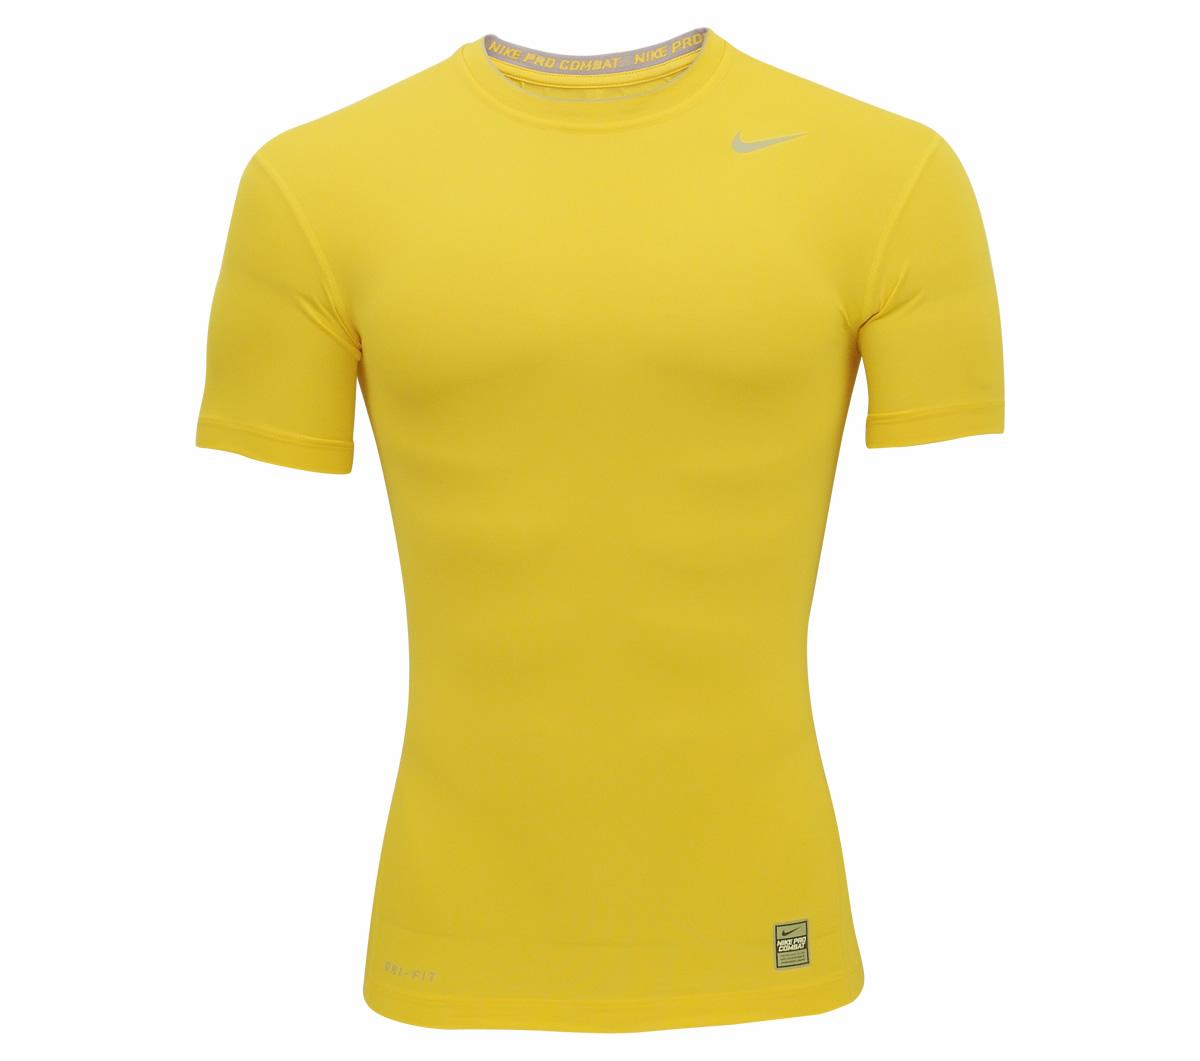 5b0d9281521f3 Camisa Nike Pro Core Manga Curta Ajustado Amarela - Mundo do Futebol